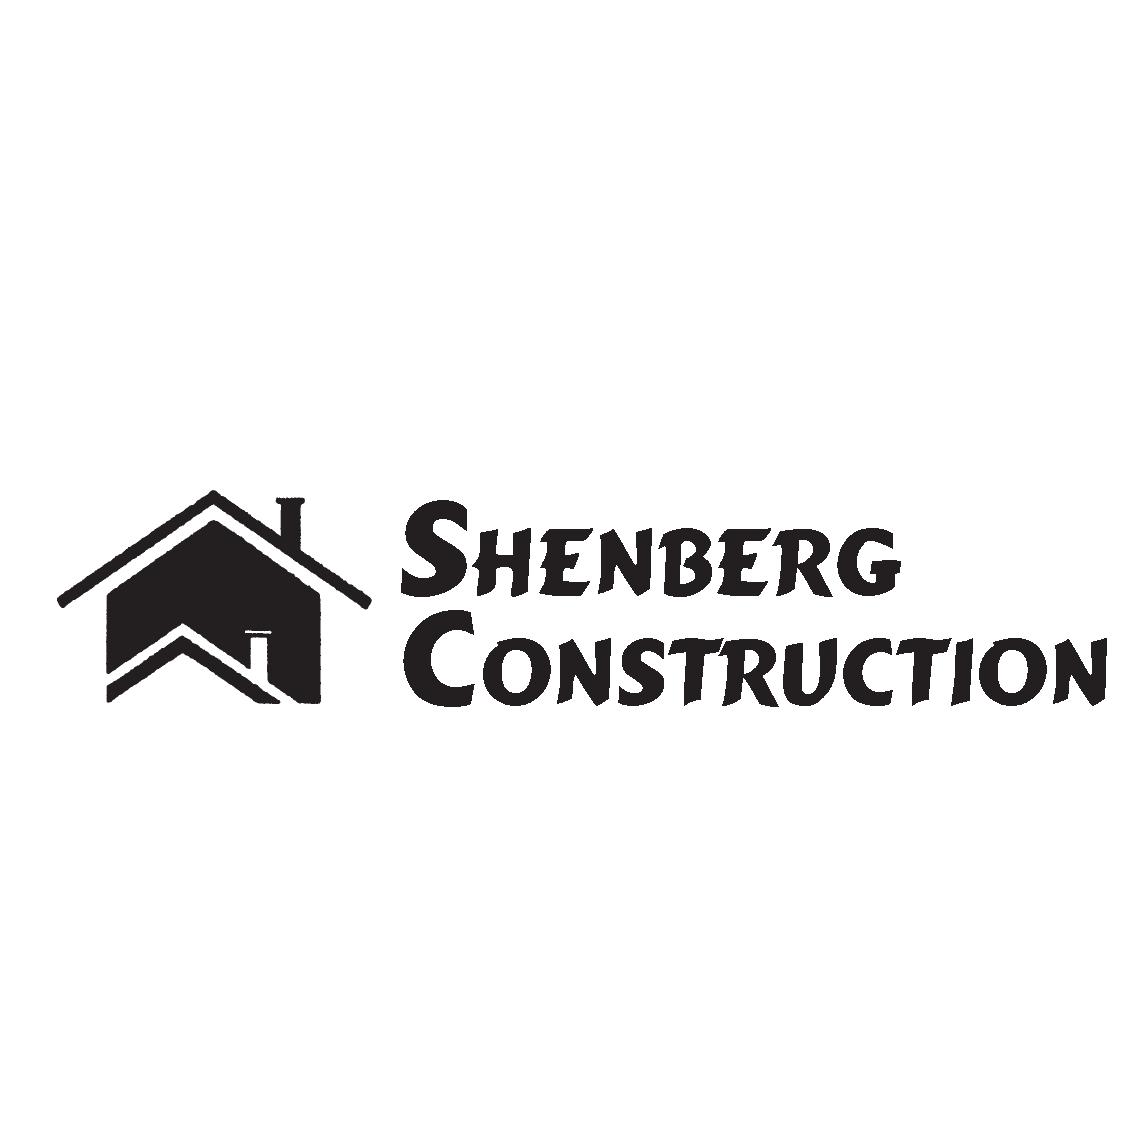 Shenberg Construction